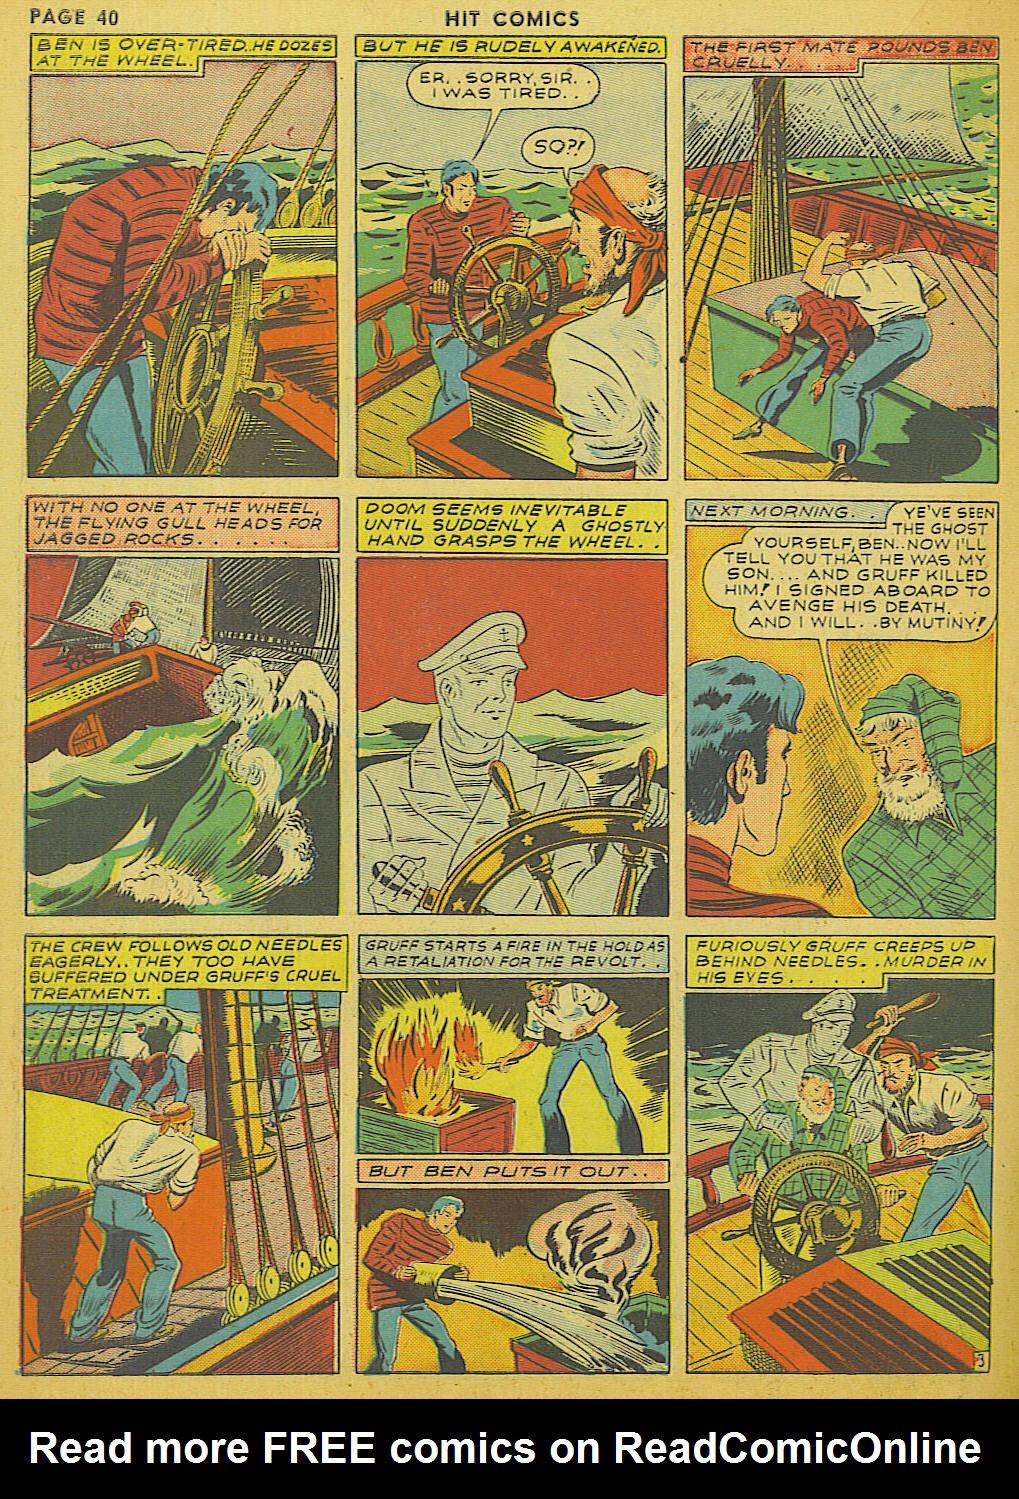 Read online Hit Comics comic -  Issue #13 - 42